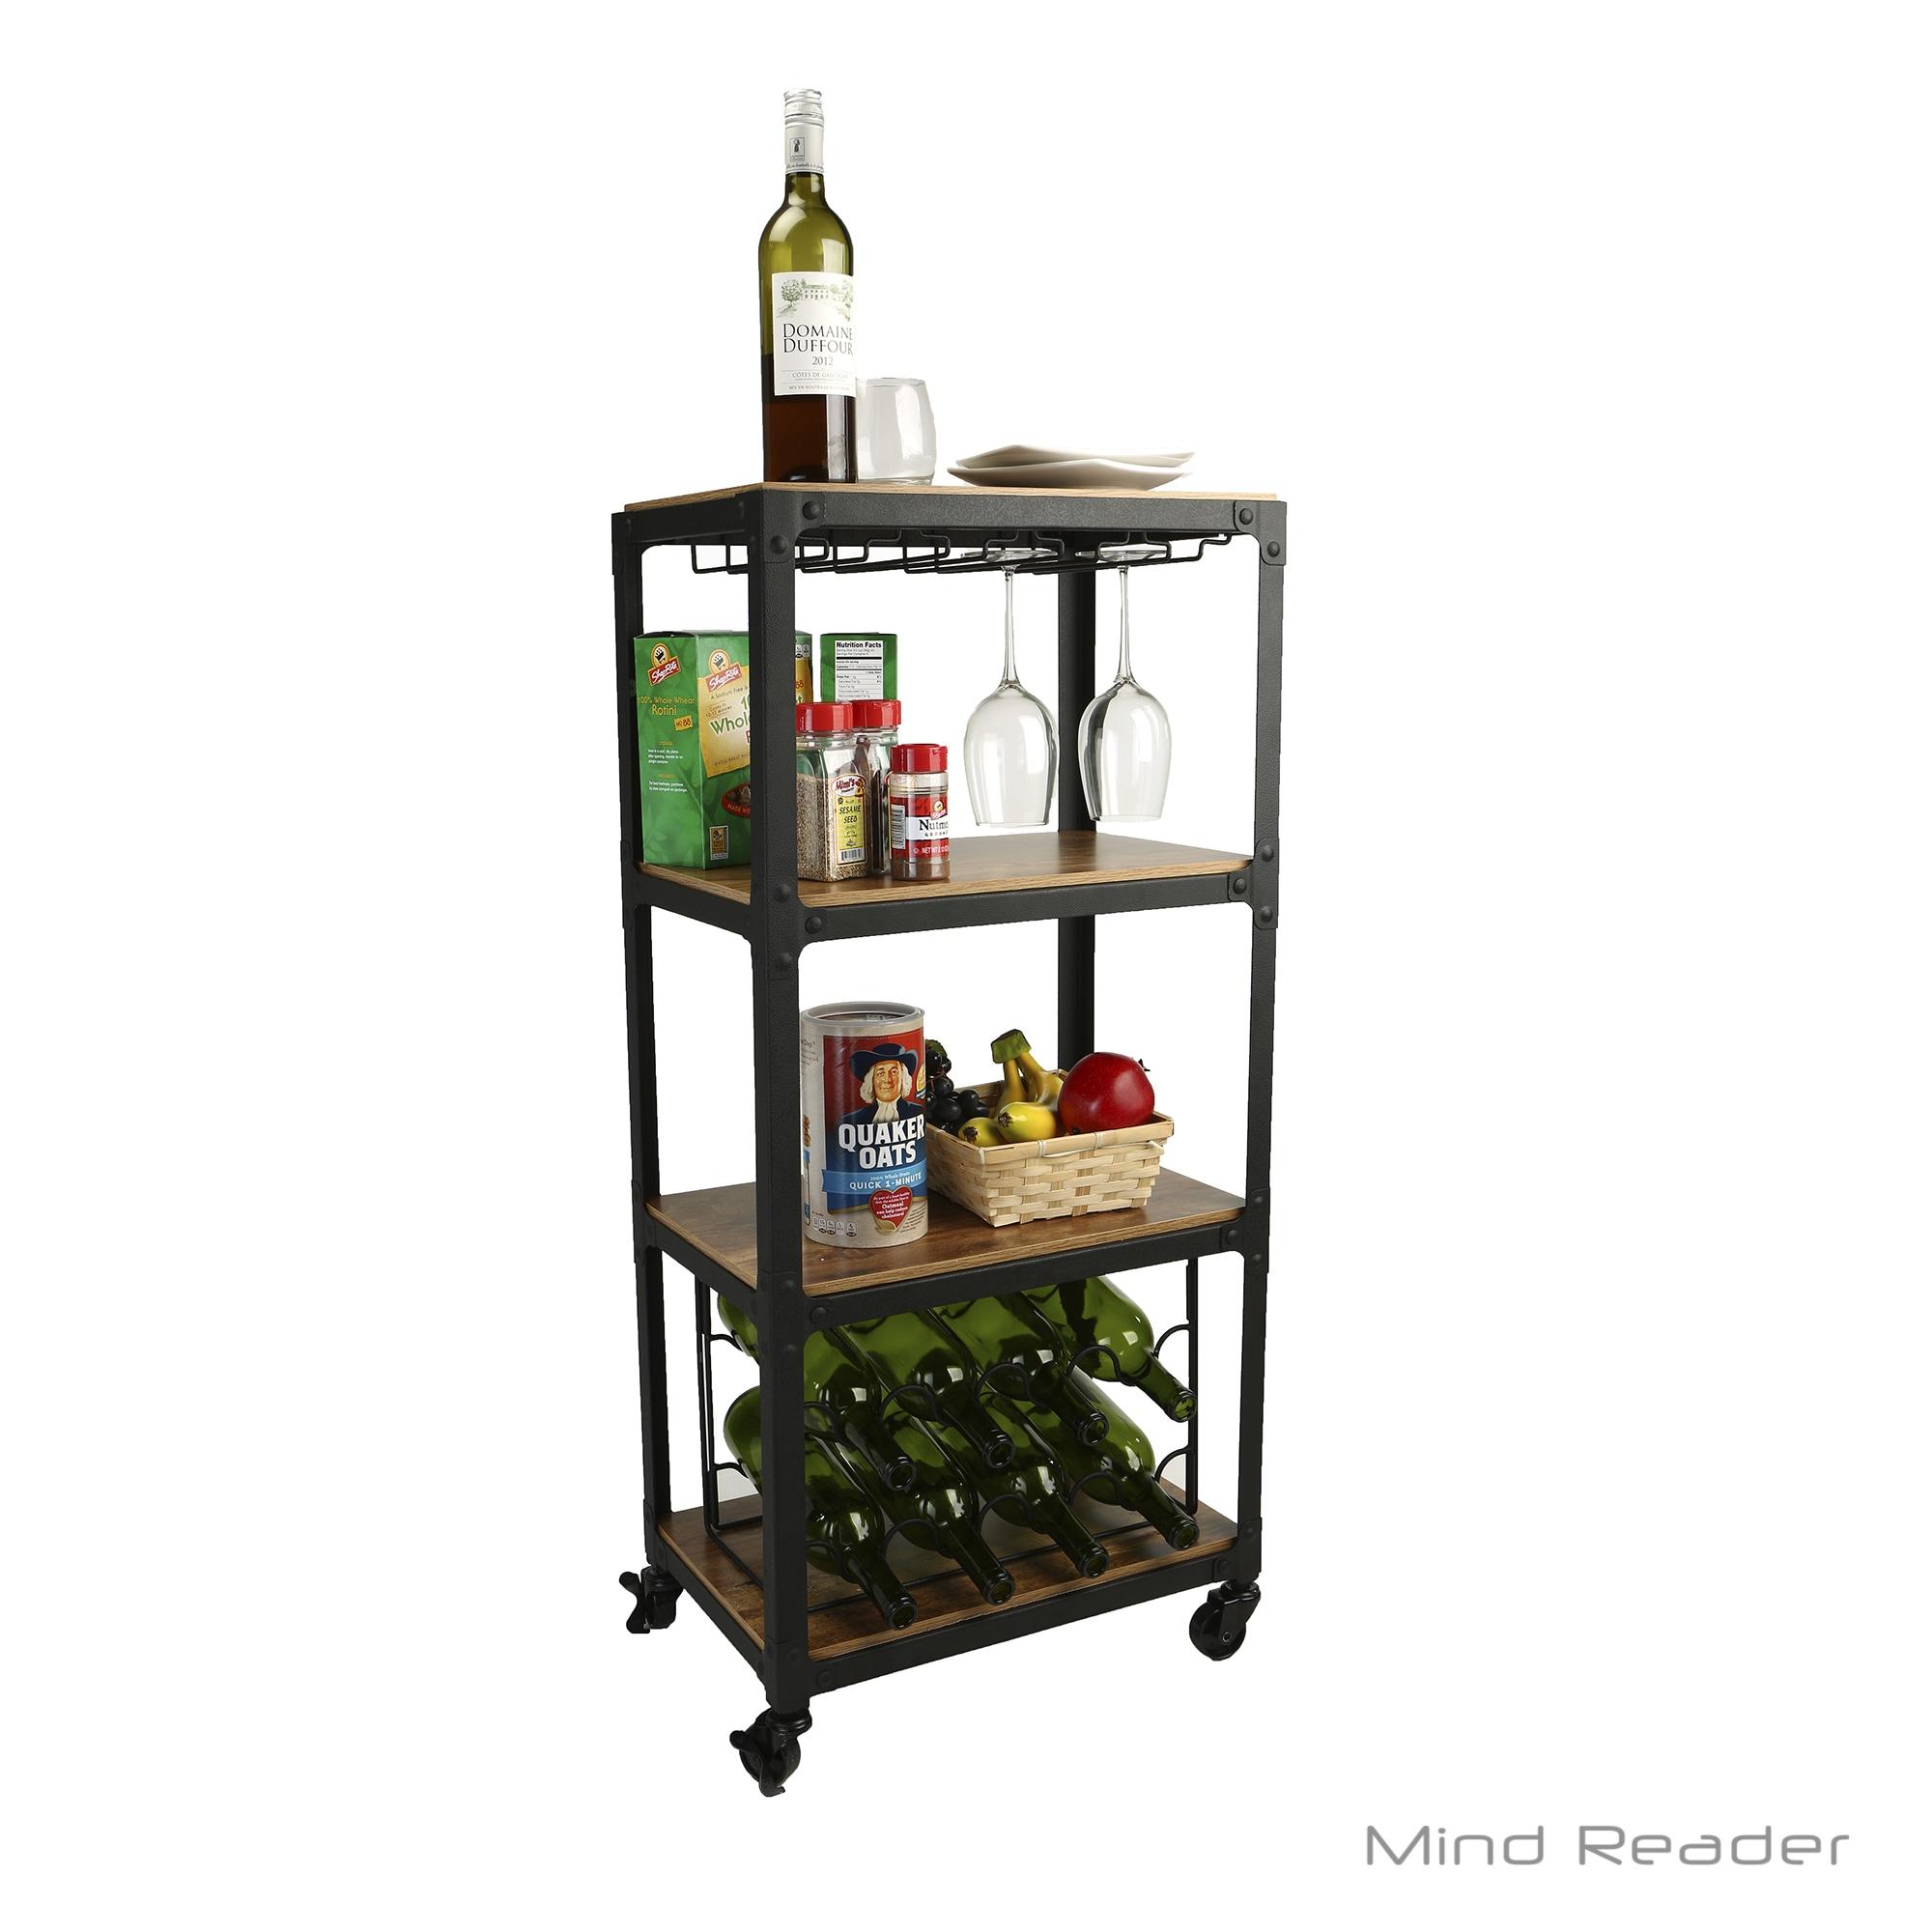 Carbon Loft Kessler 4-tier Wood and Metal Cart with Wine Rack